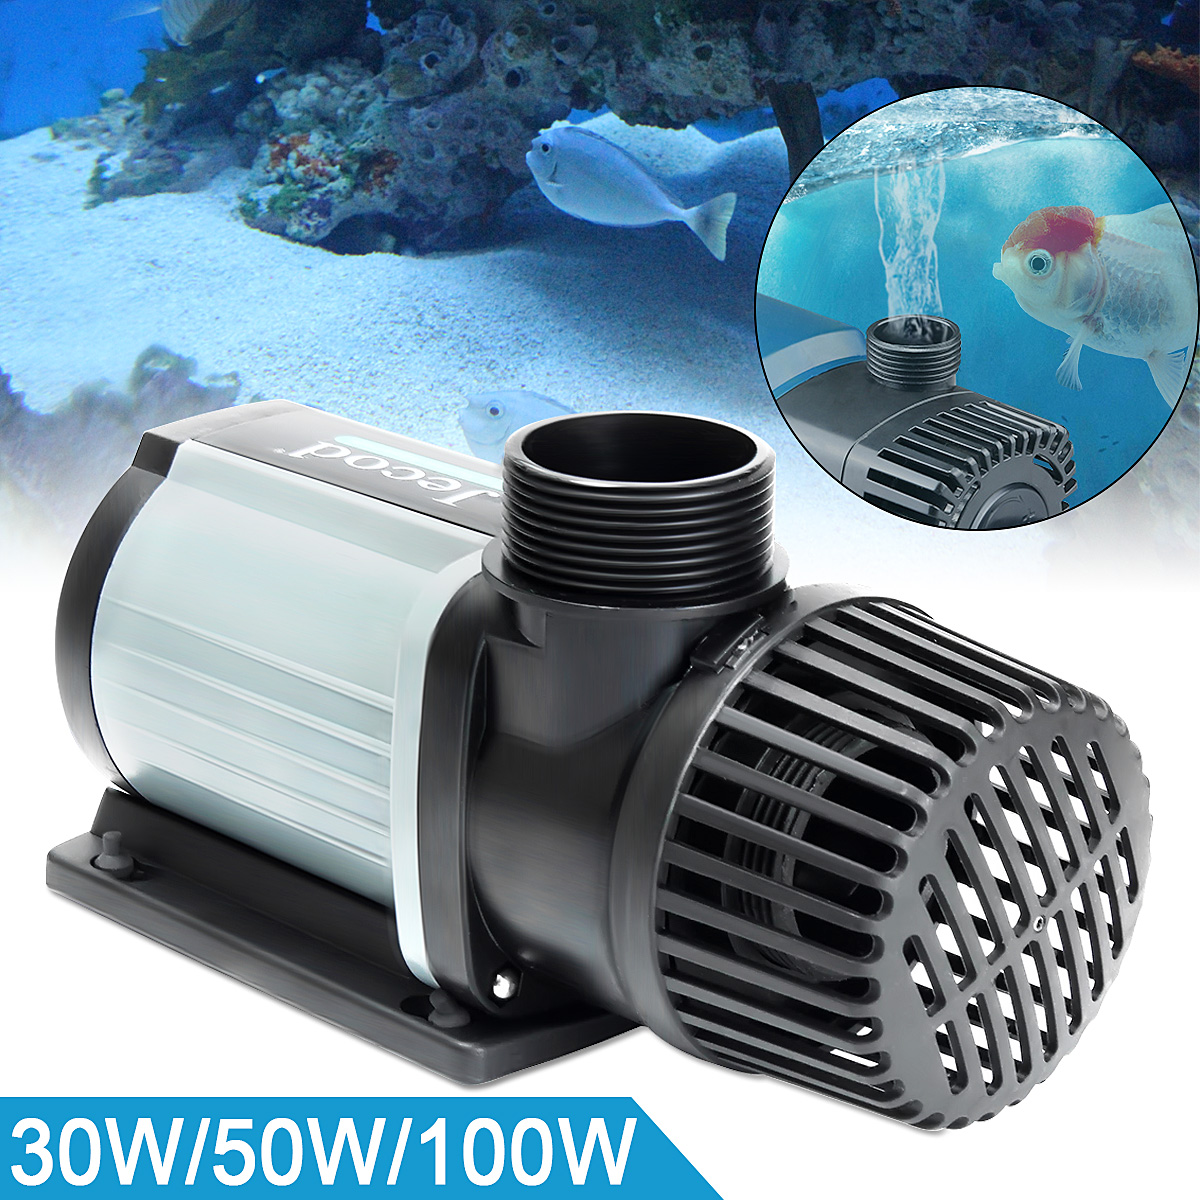 30/50/100 W DC Marina acuario bomba sumergible 3000L funcionamiento súper silencioso flujo Variable controlador DCS 2000 -12000 con adaptador